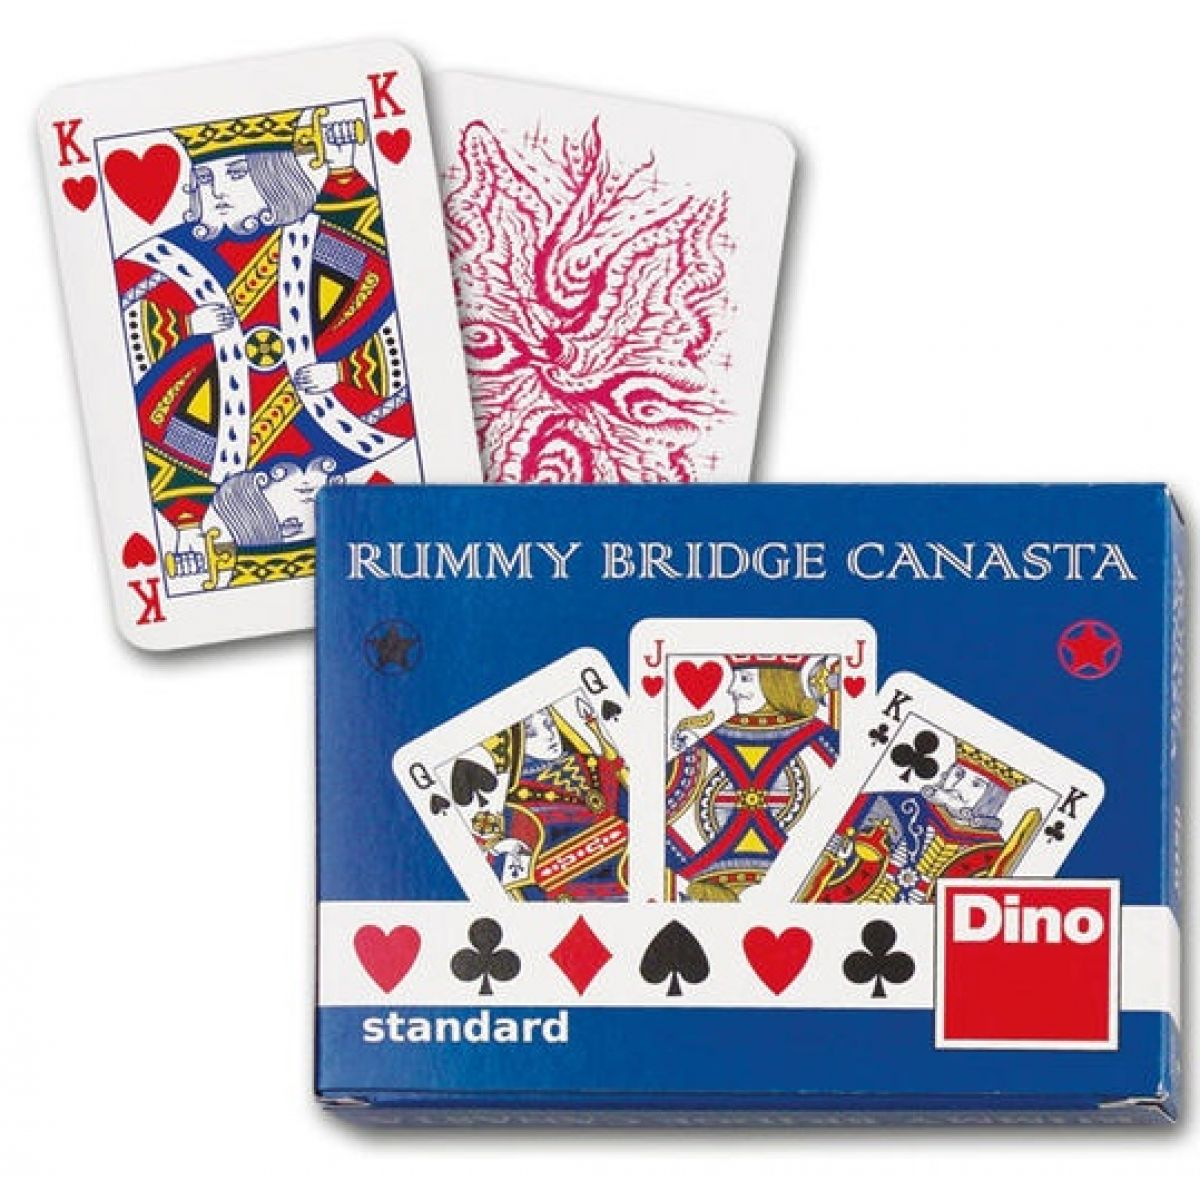 Dino Canasta standard